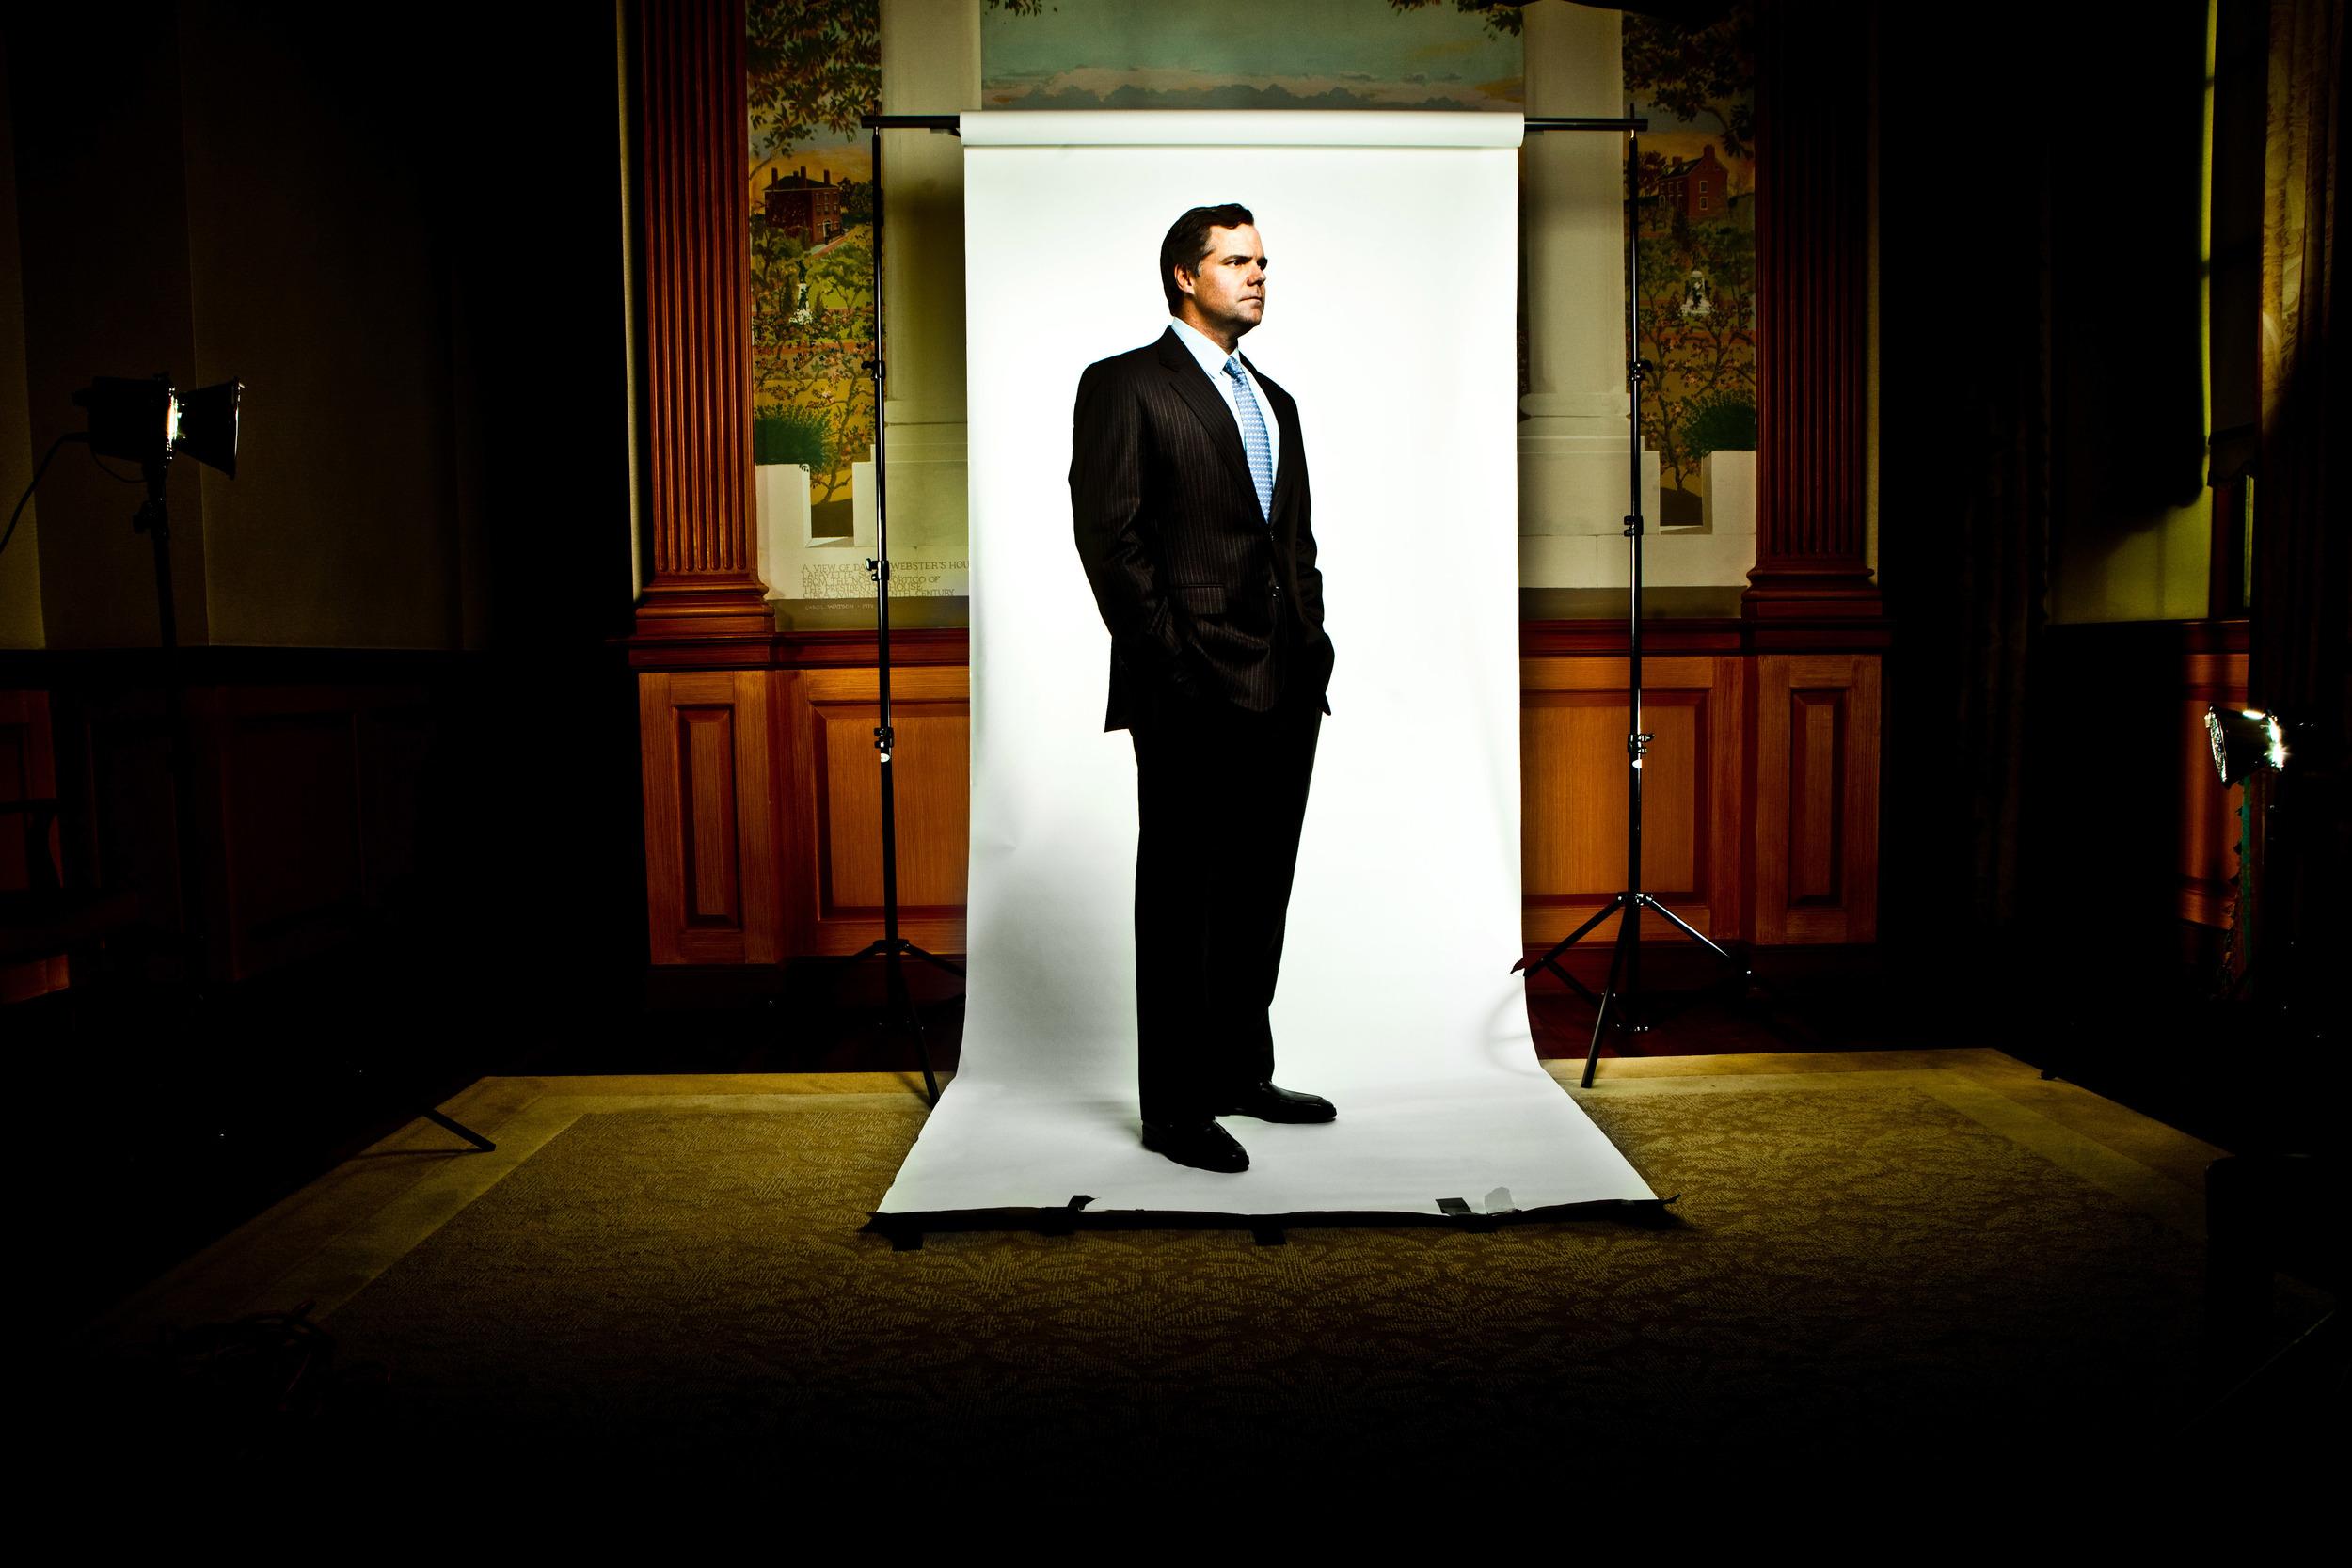 MGM Mirage CEO Jim Murren